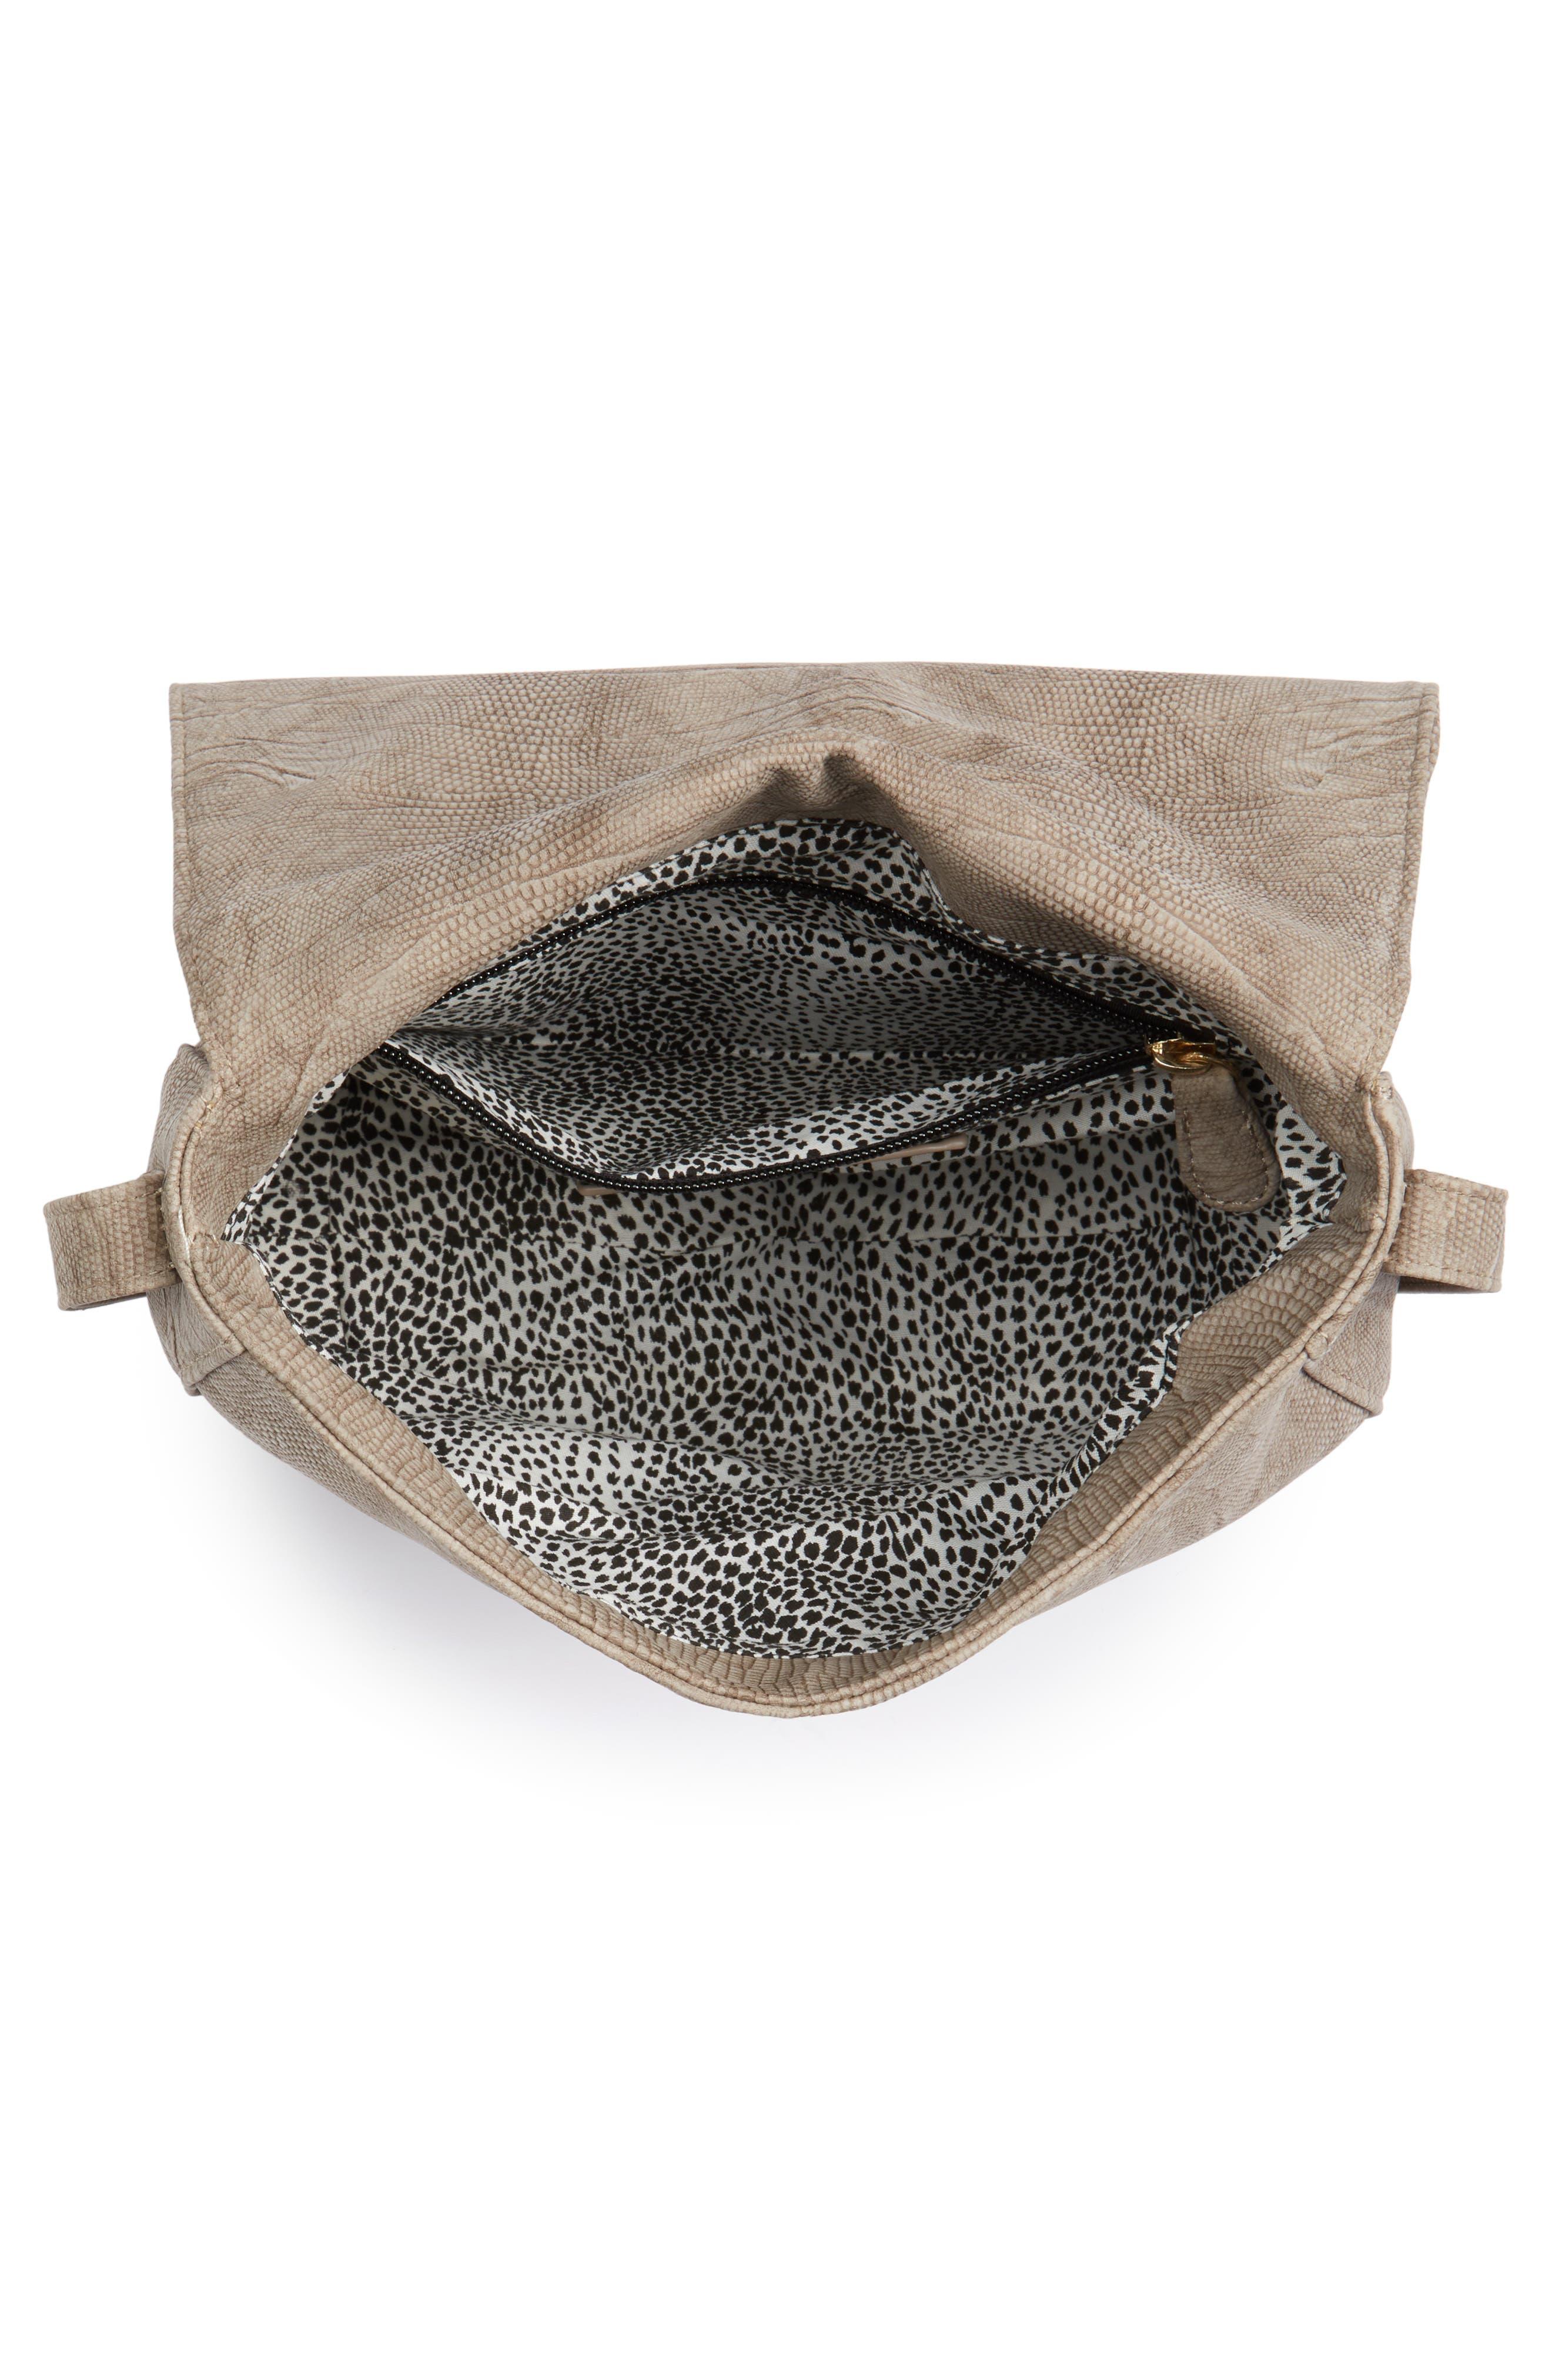 Livvy Faux Leather Crossbody Saddle Bag,                             Alternate thumbnail 4, color,                             250